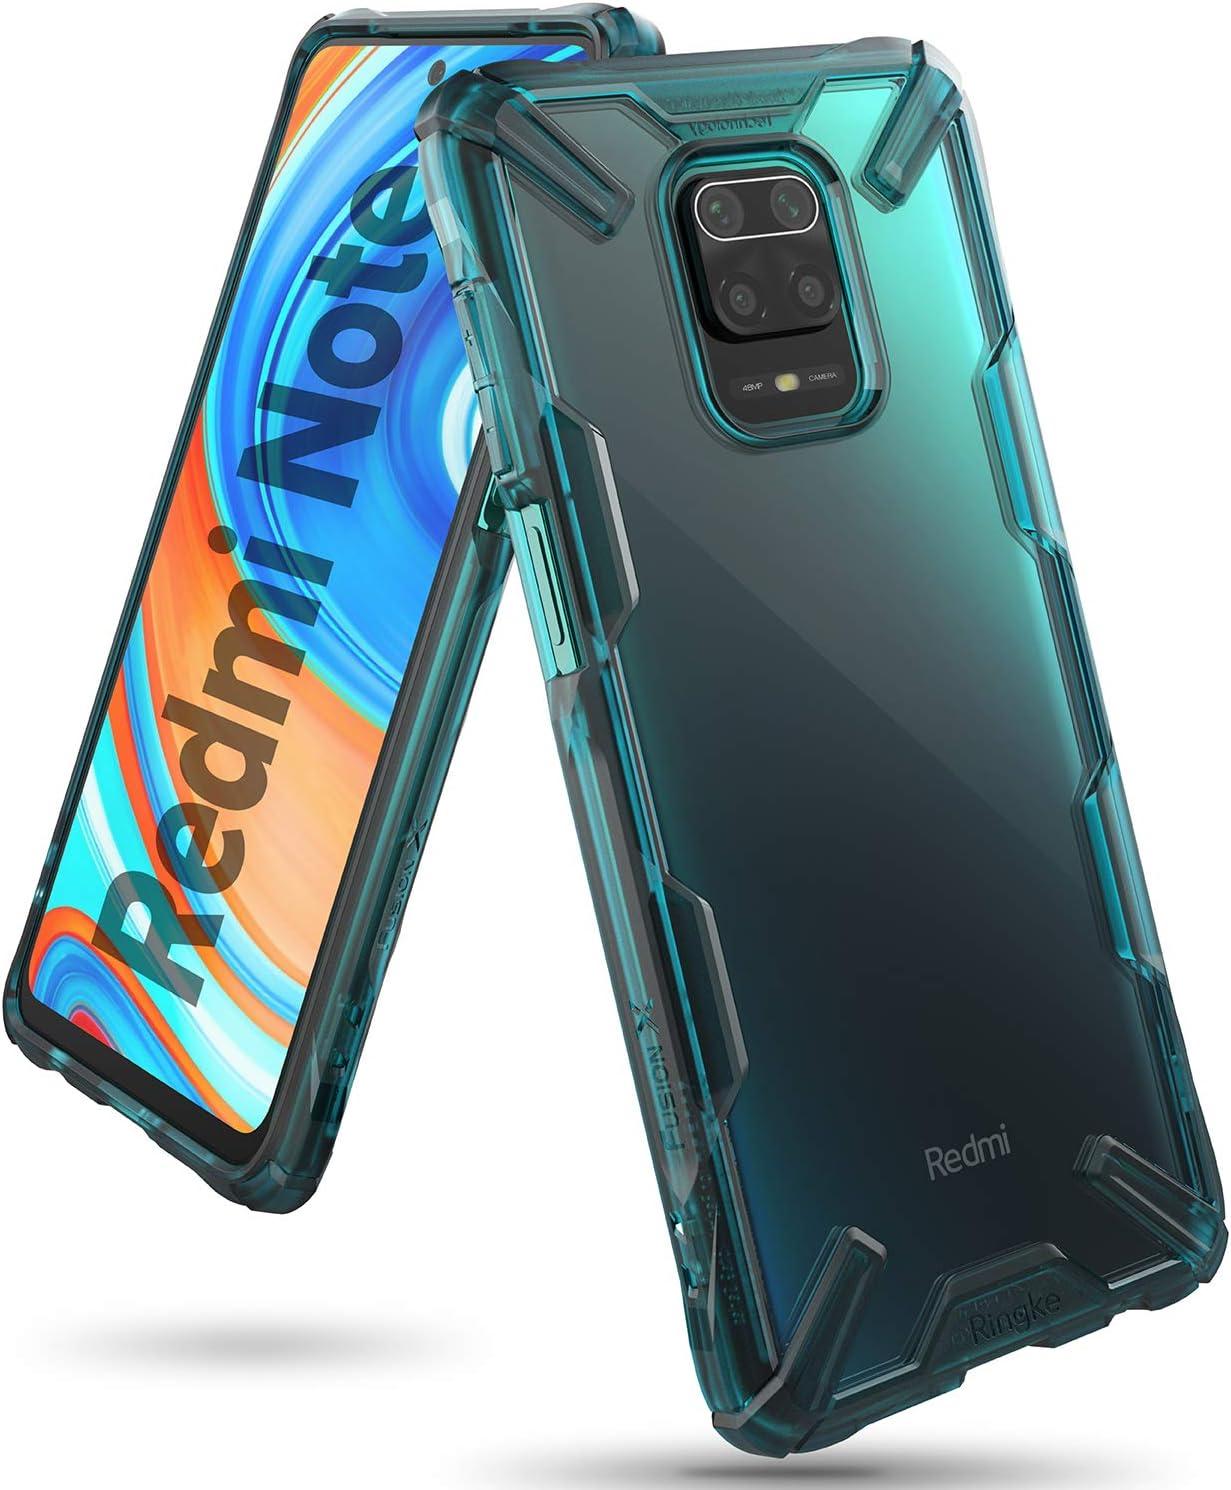 Ringke Fusion-X Diseñado para Funda Xiaomi Redmi Note 9 Pro (2020), Carcasa Redmi Note 9S, Parachoque Resistente Impactos Funda Redmi Note 9S / Redmi Note 9 Pro (6.67 Pulgadas) - Turquoise Green